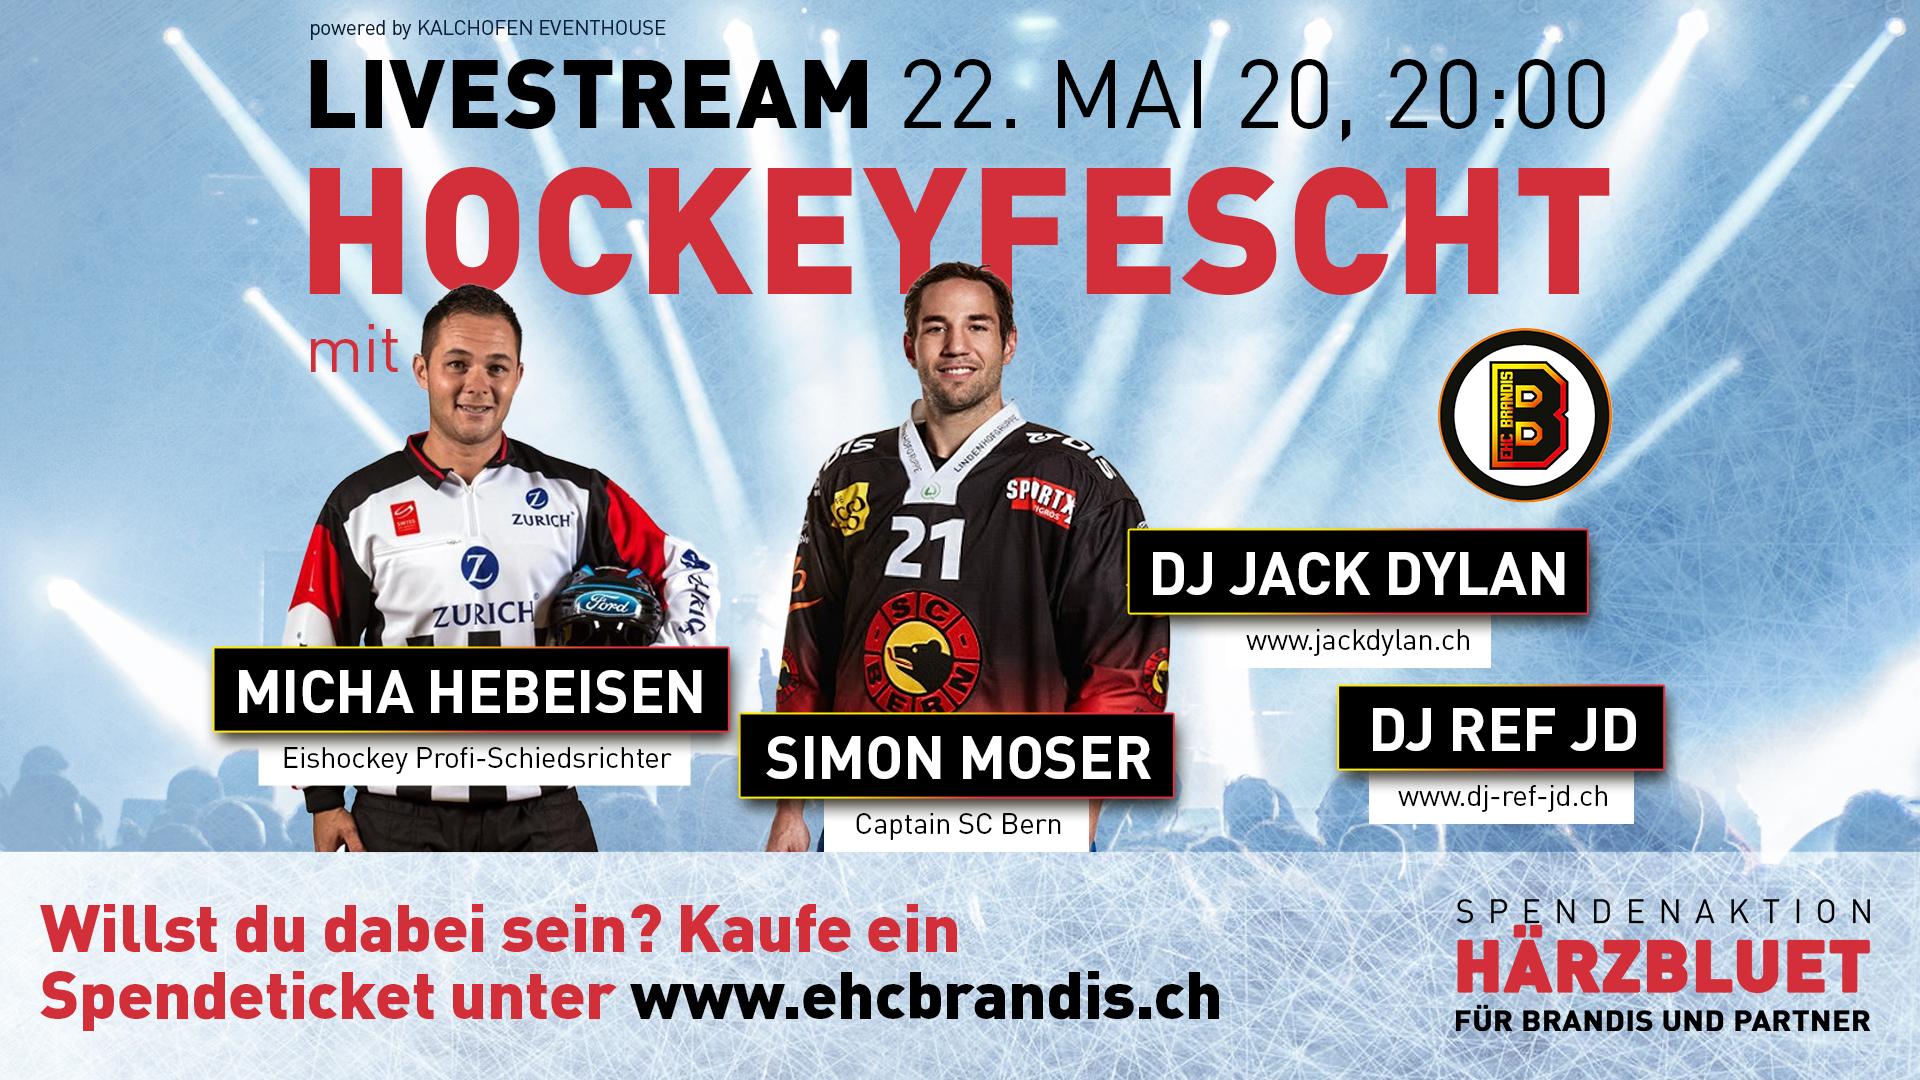 http://www.ehcbrandis.ch/wp-content/uploads/2020/05/LiveStream_Event.jpeg